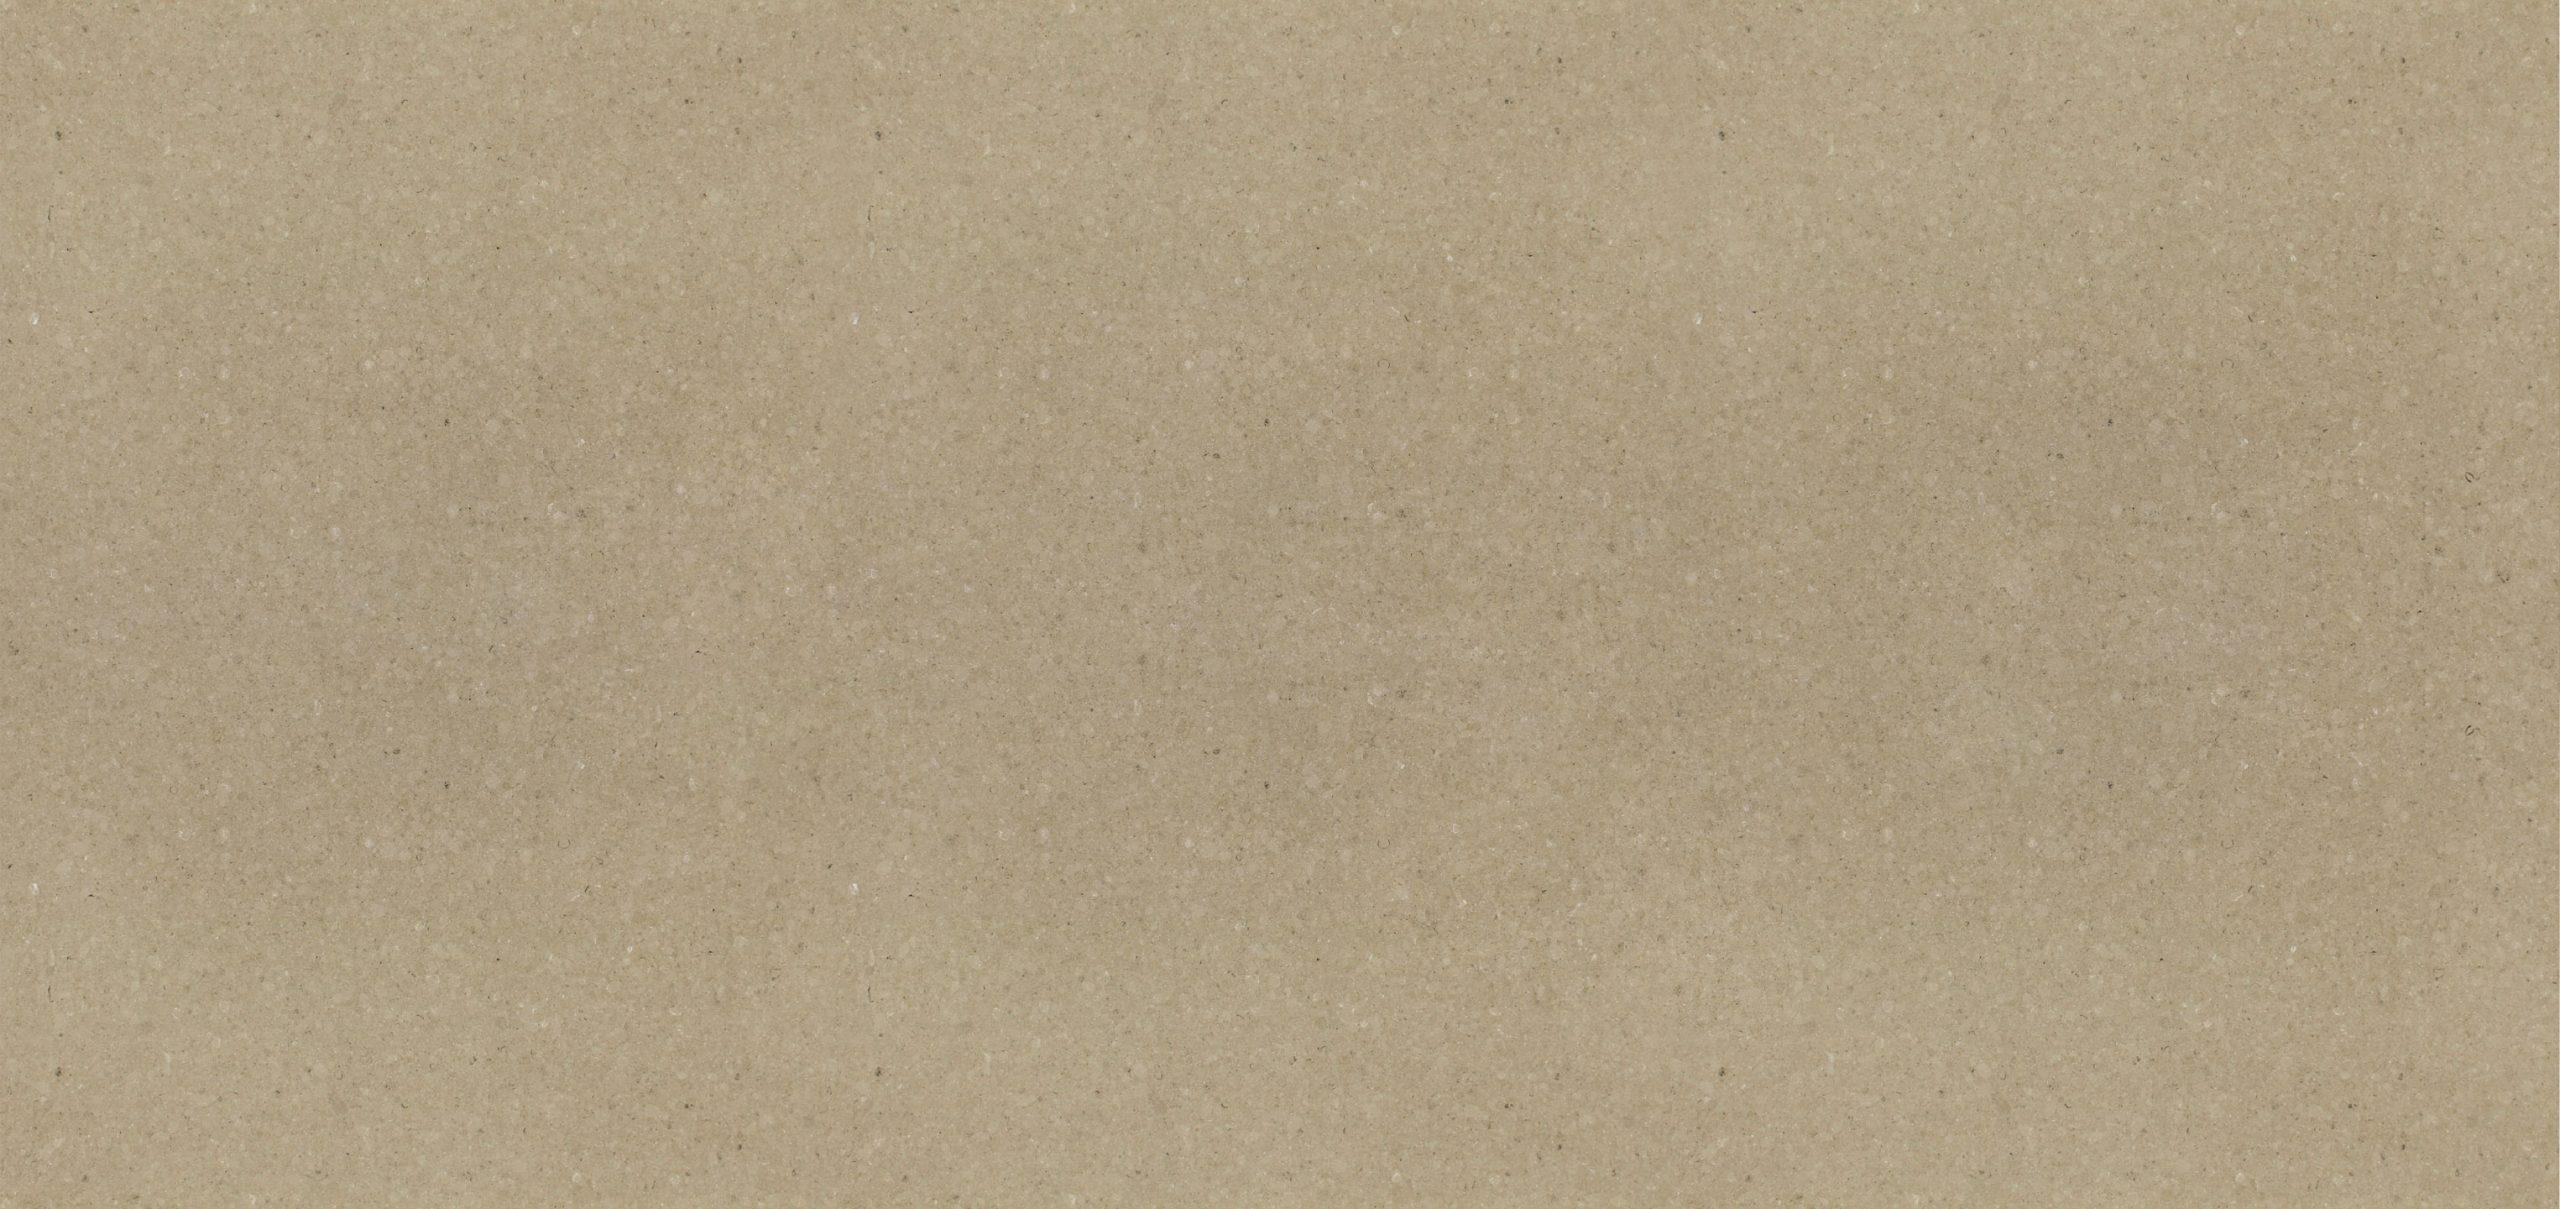 Vicostone Jura Grey BQ8437 02